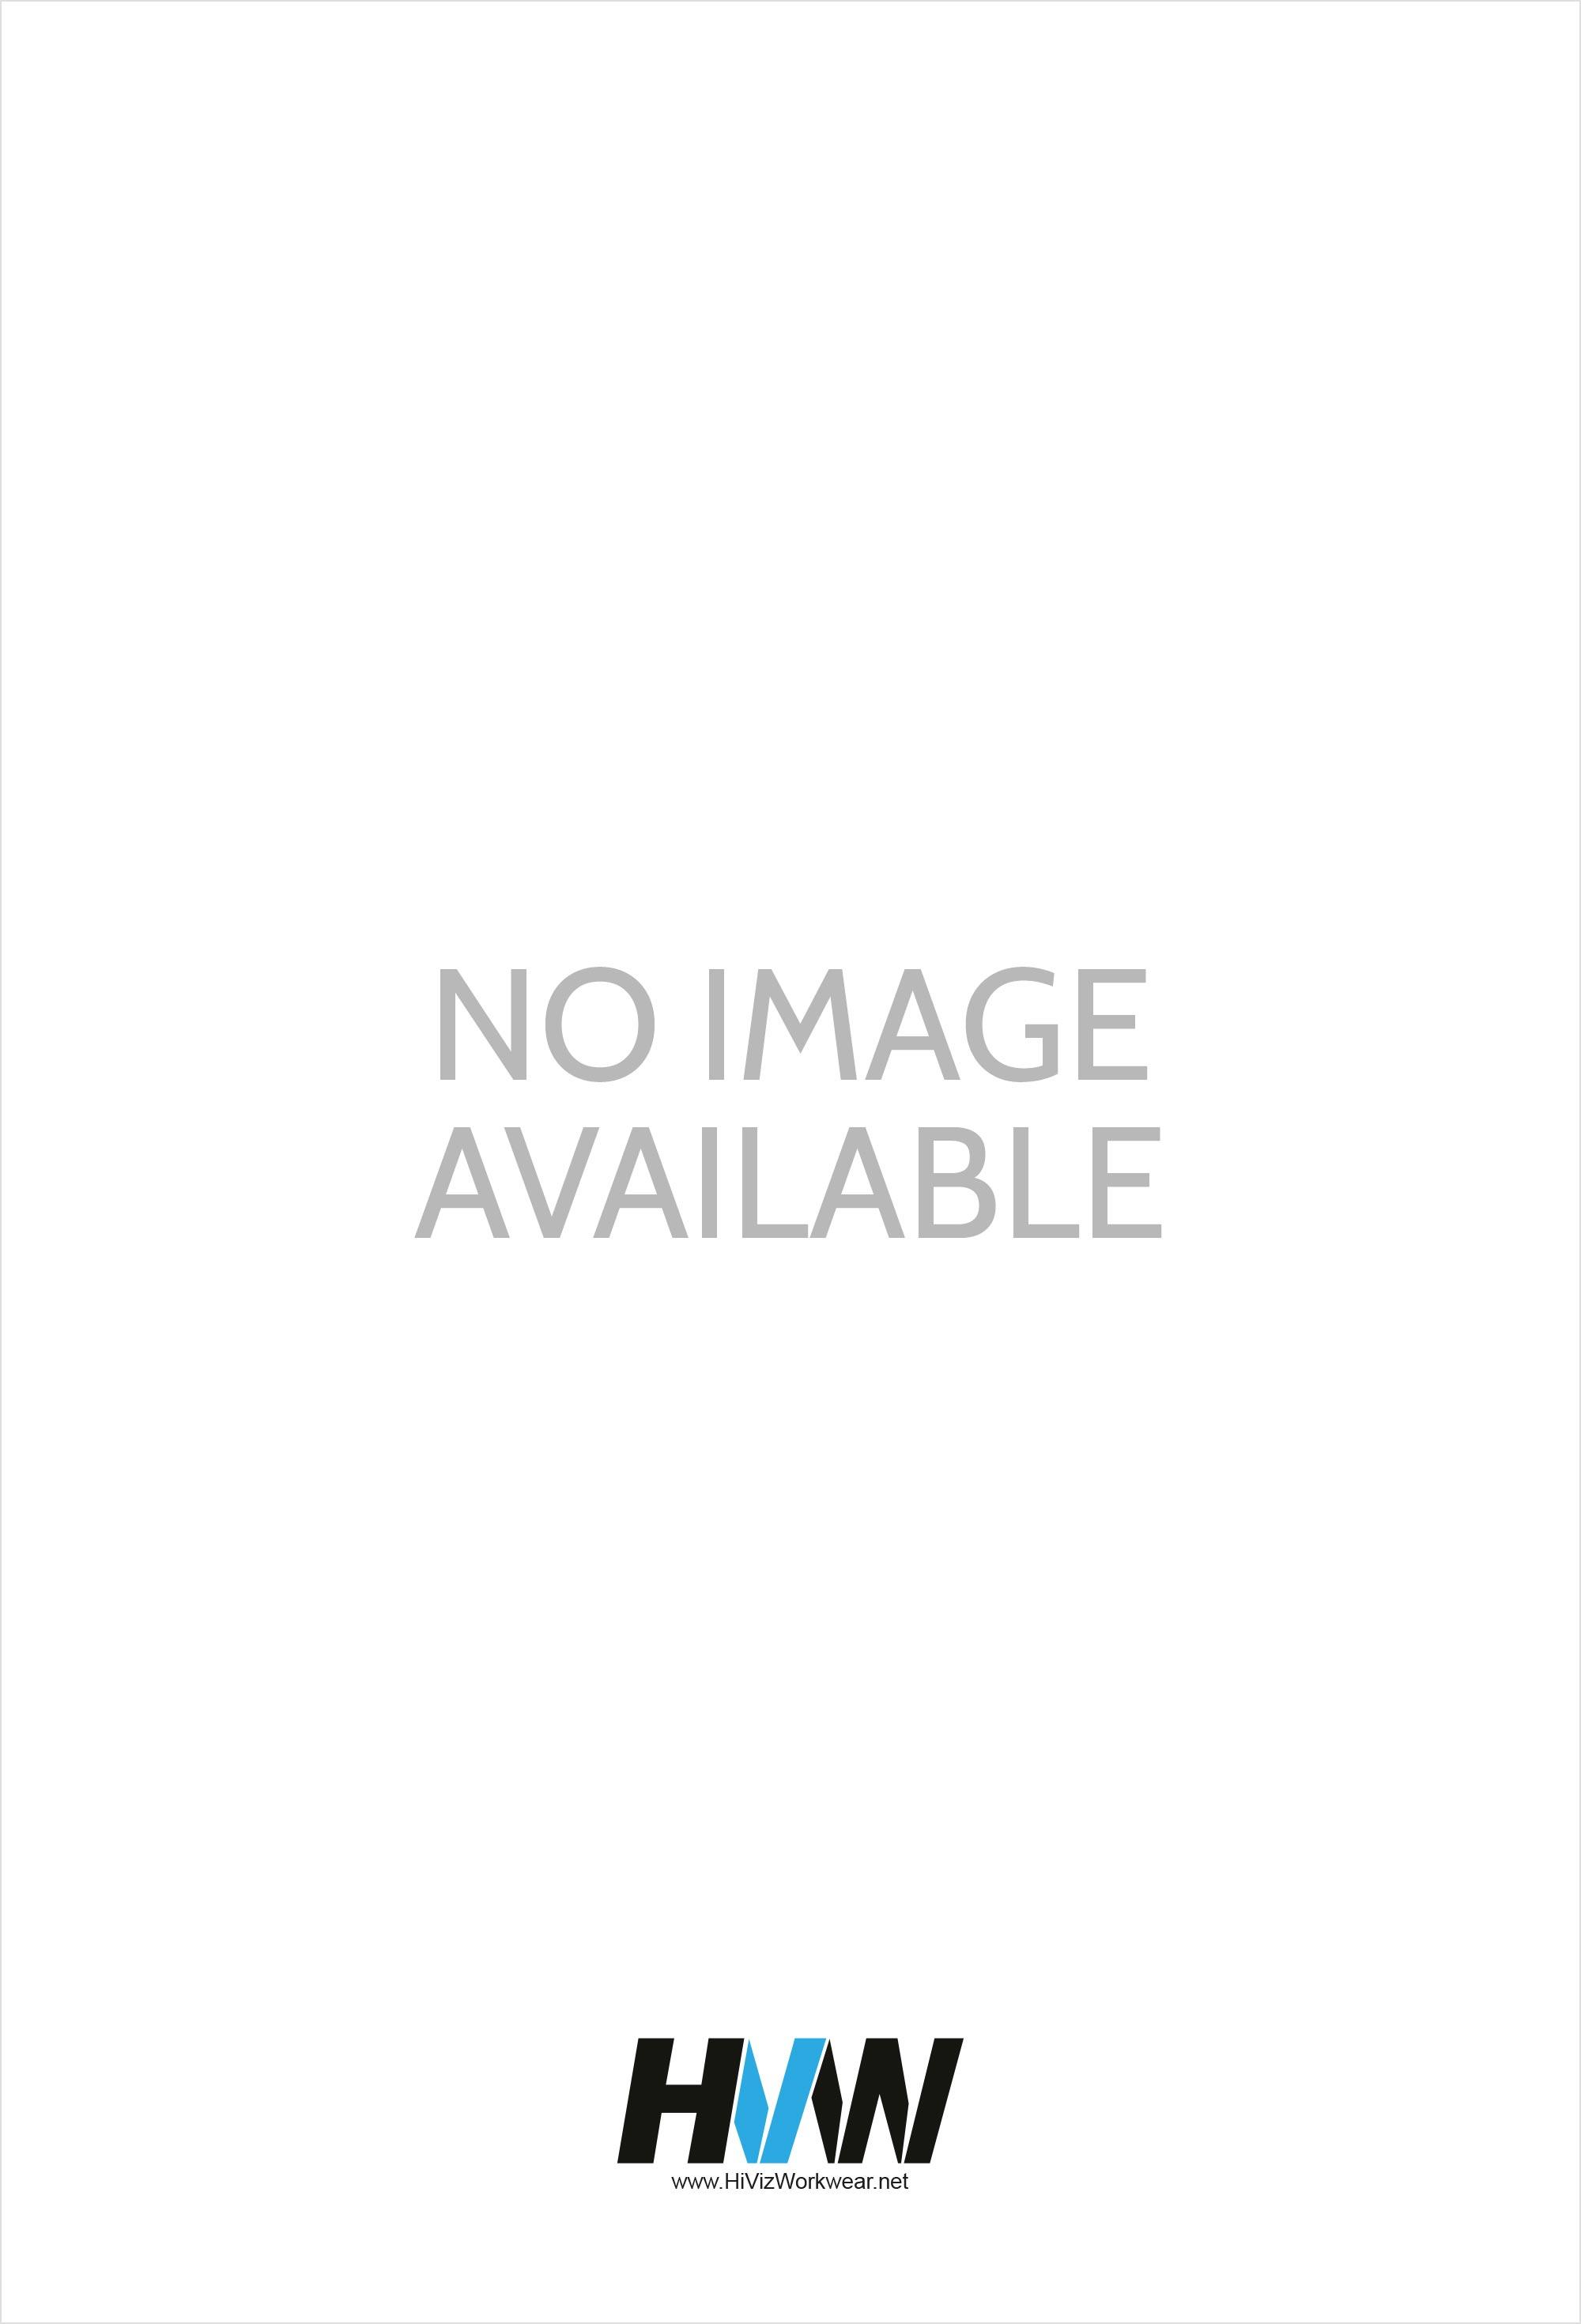 KK140 Workforce Long Sleeved Shirt (S To 3XL)